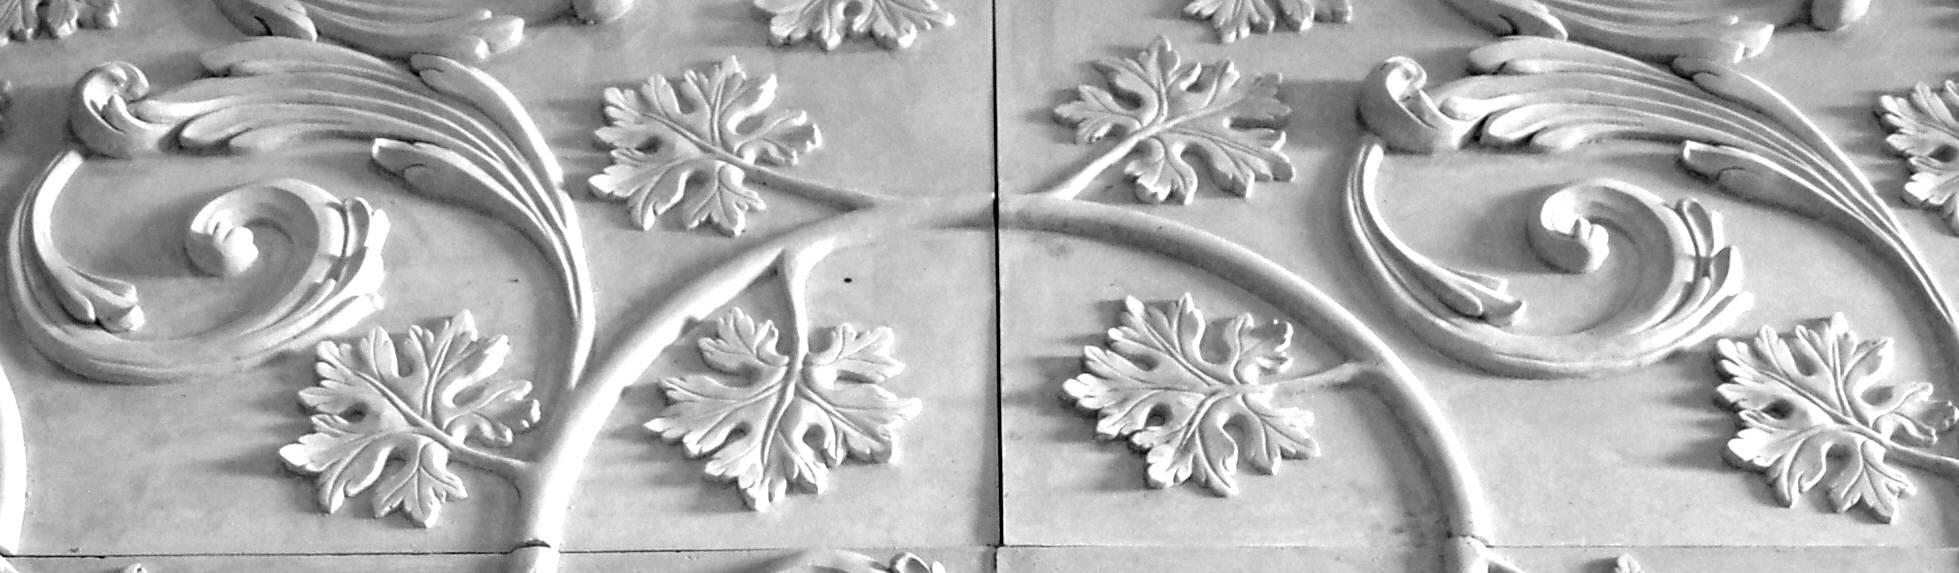 Iva Viana Atelier de Escultura